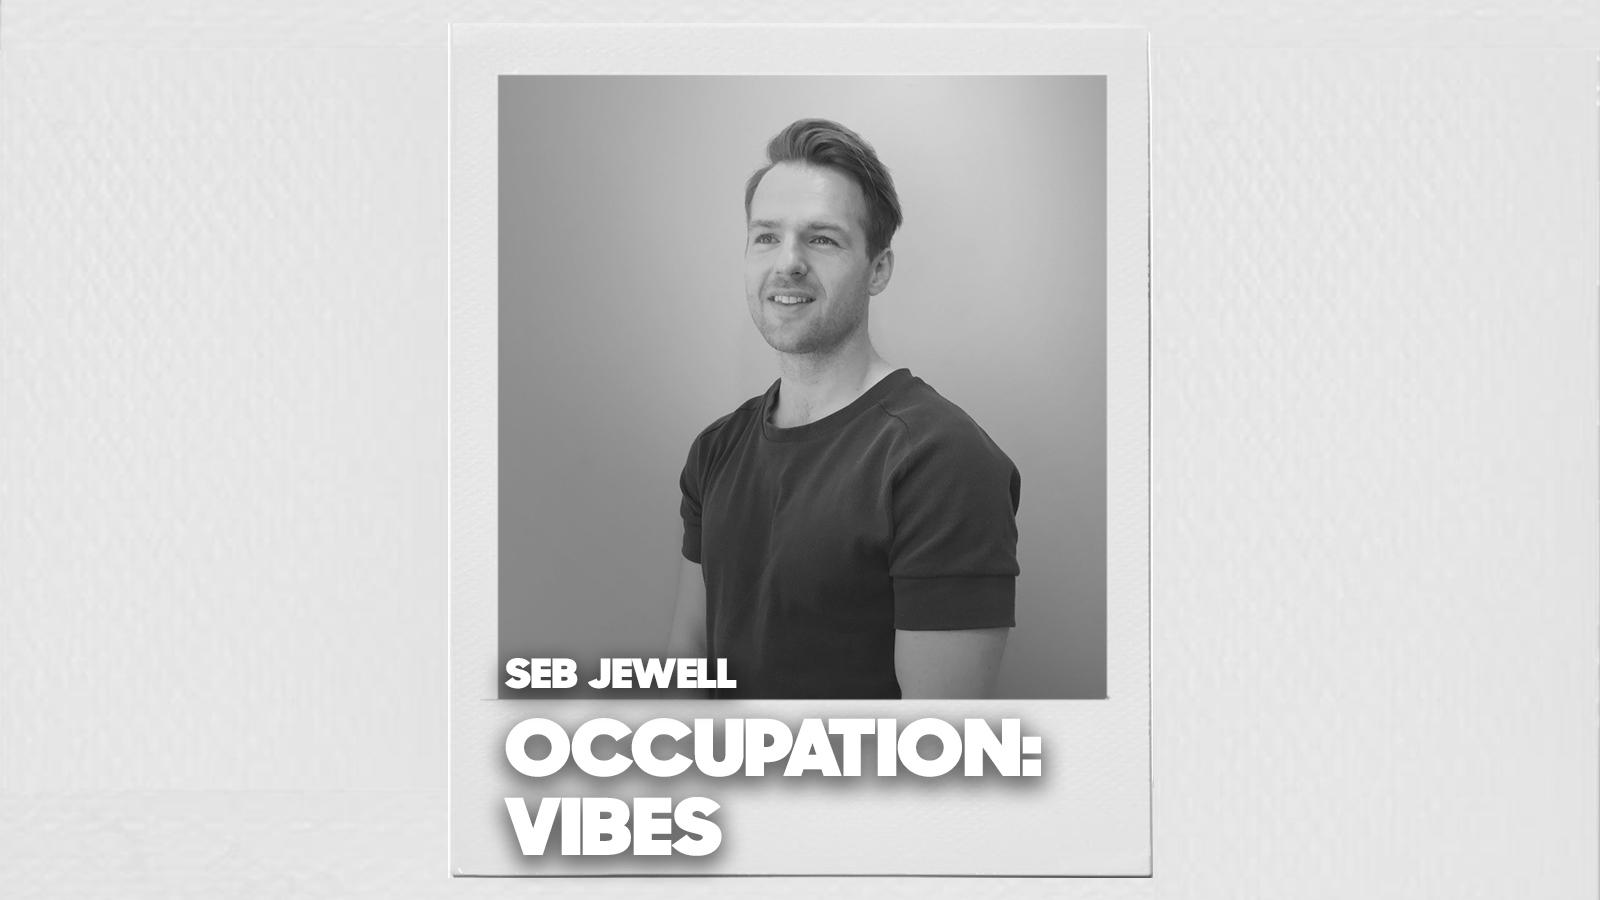 Occupational Vibes: Seb Jewell